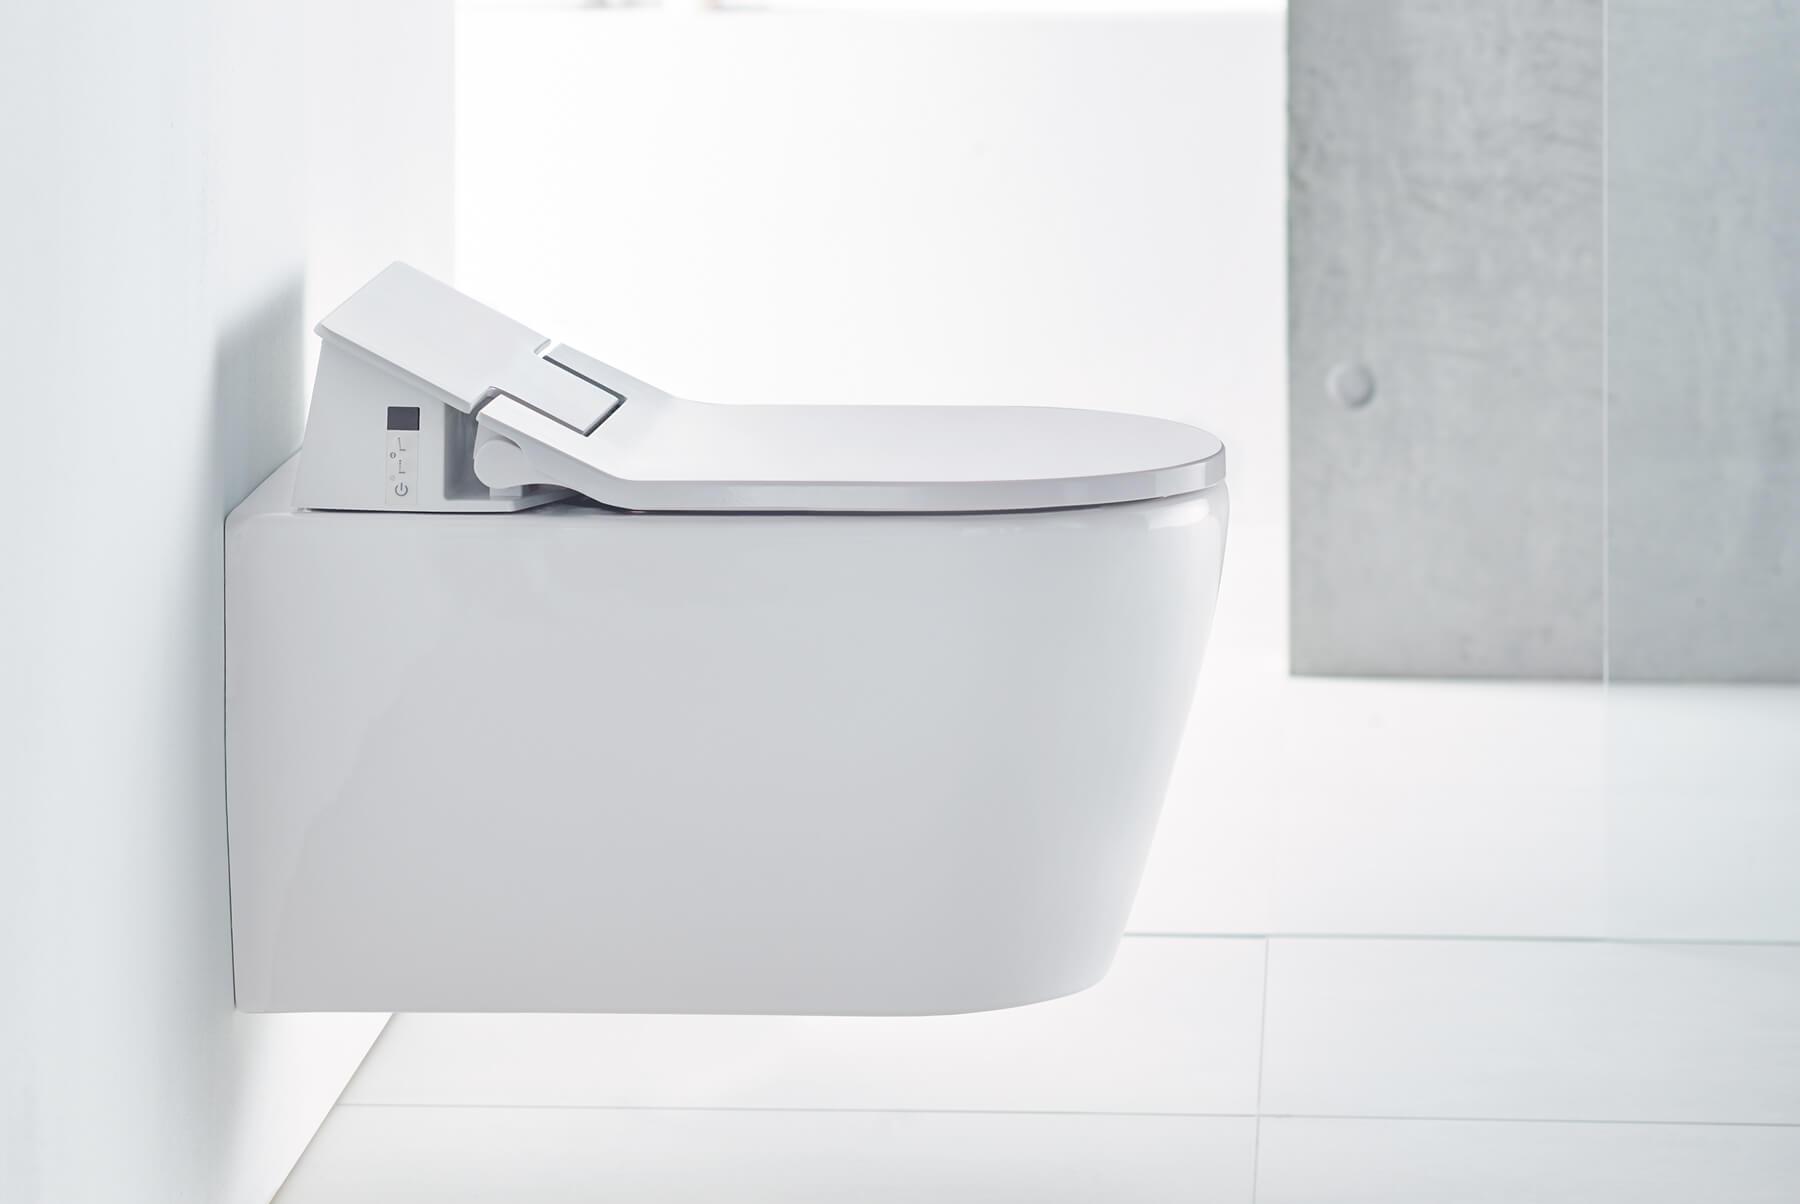 WC-&-WASHLETS-Duravit-SensoWash-INSET-4-1800x1204